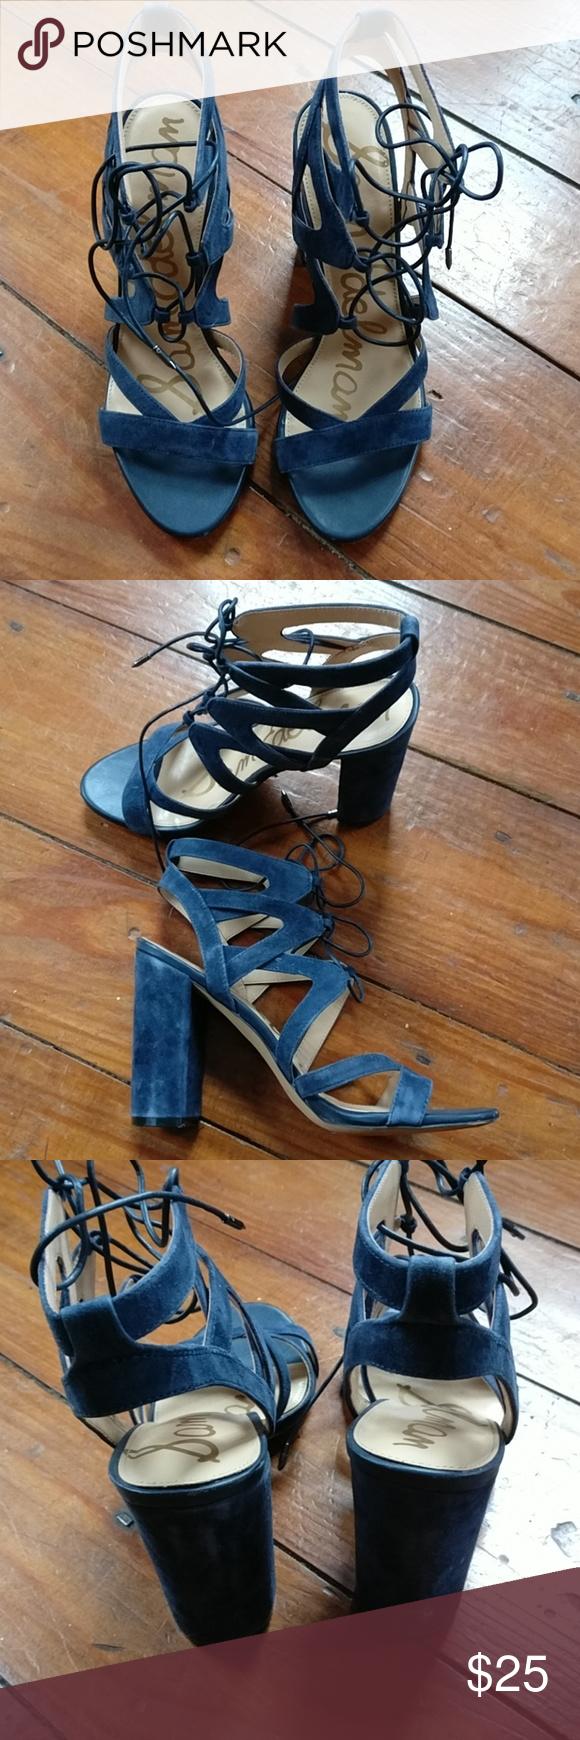 6b795766d50dd8 Sam Edelman Women s Yardley Dress Sandal Used condition inky navy Sandals  Sam Edelman Shoes Sandals